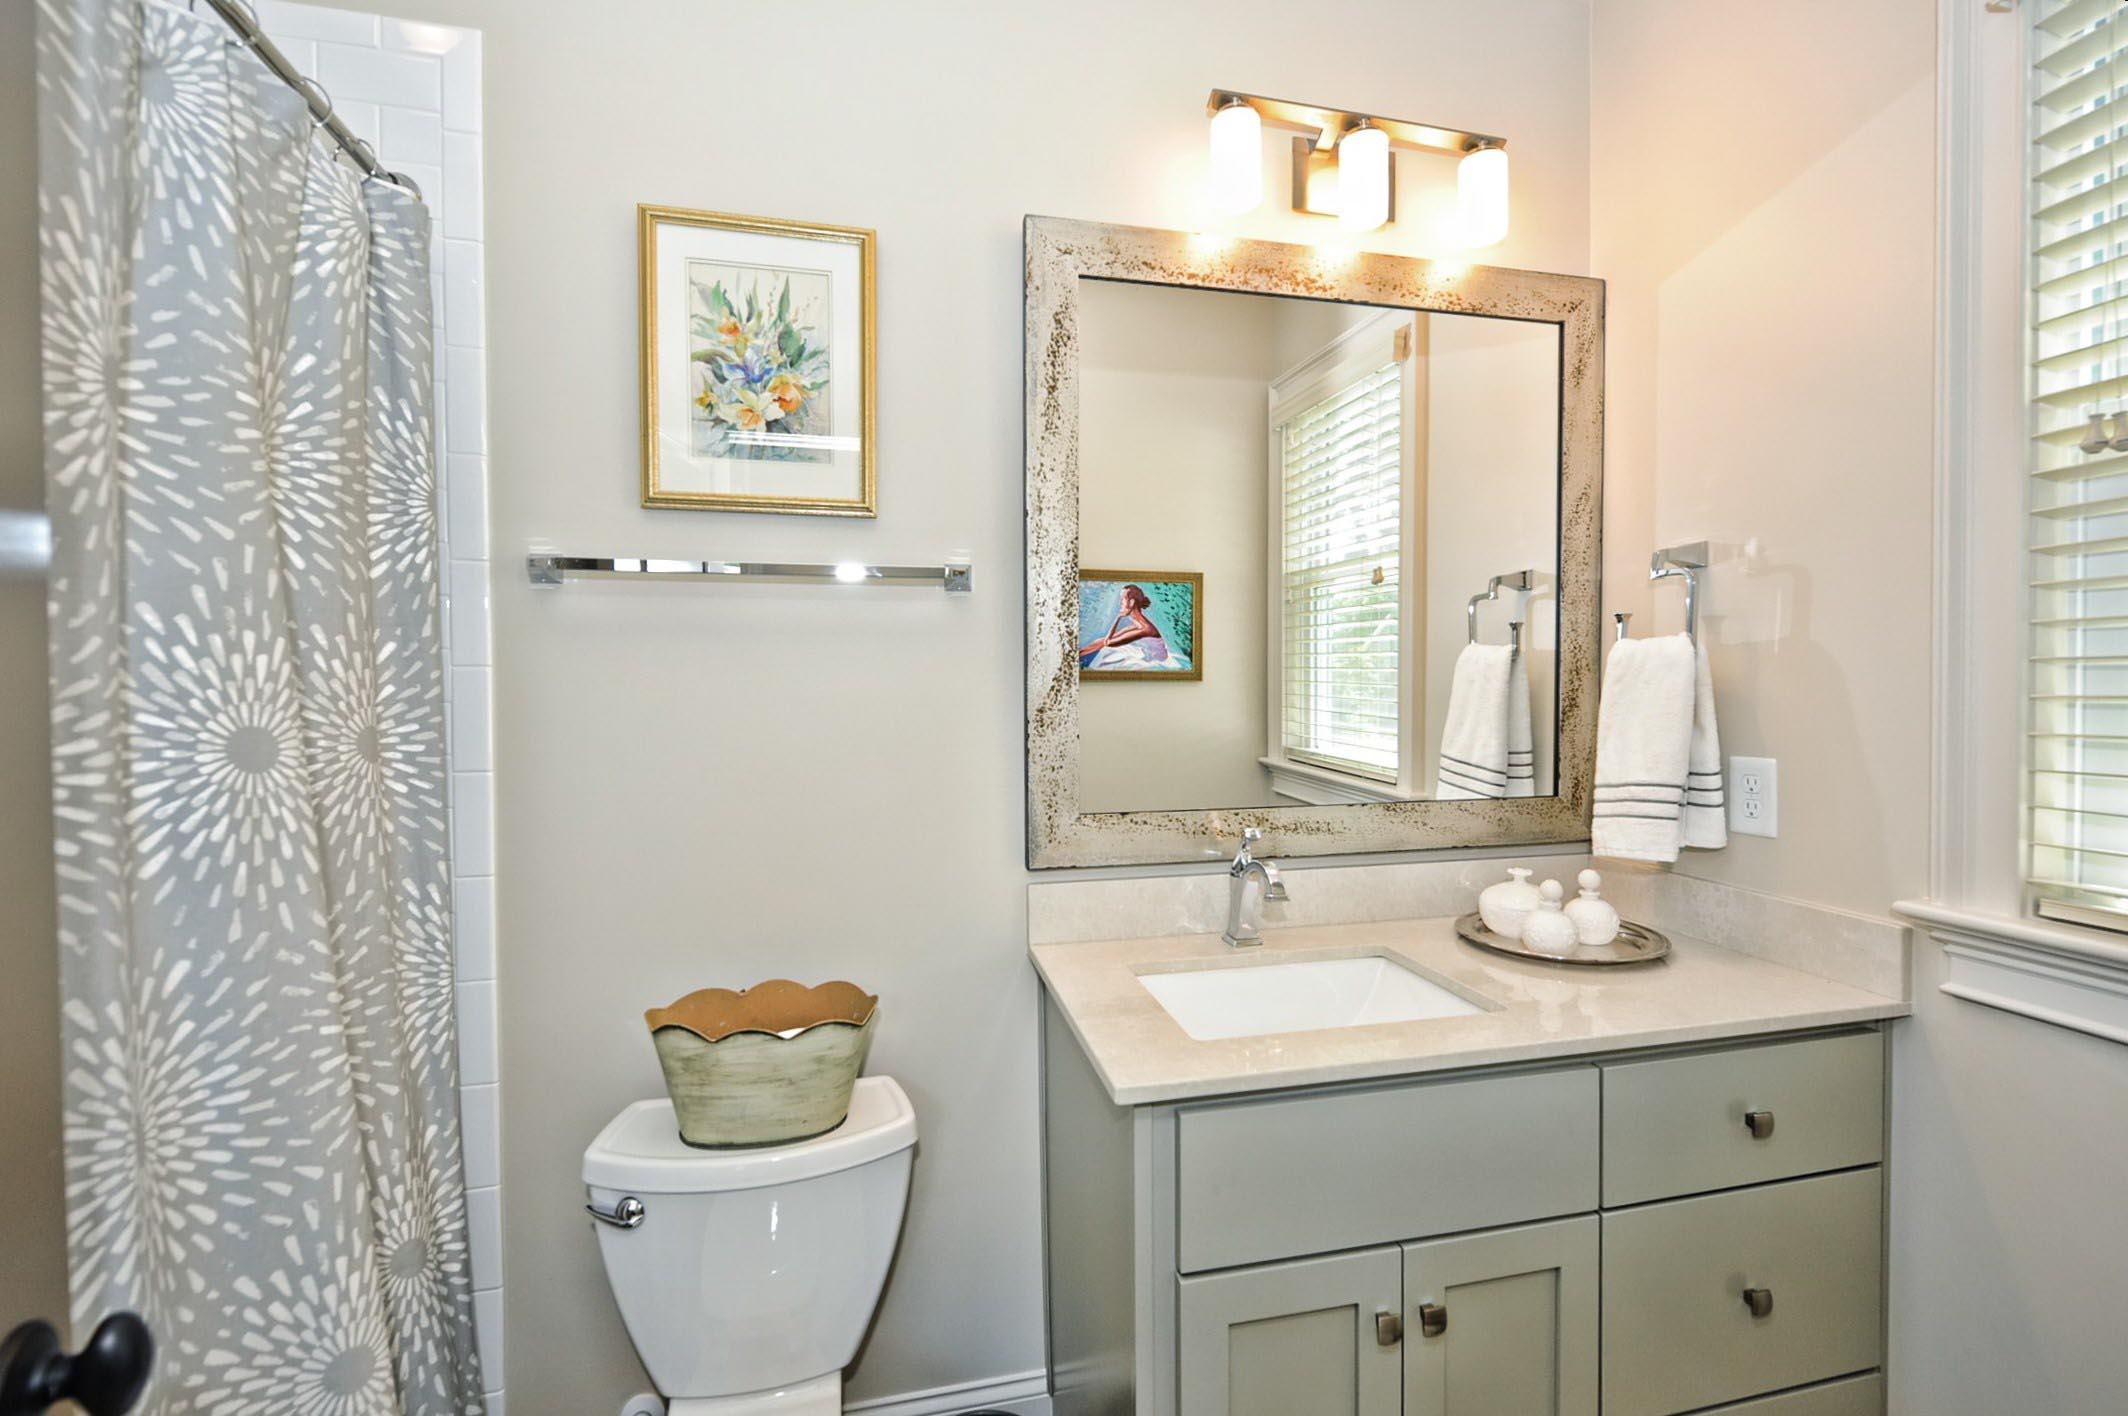 005_Bathroom.jpg